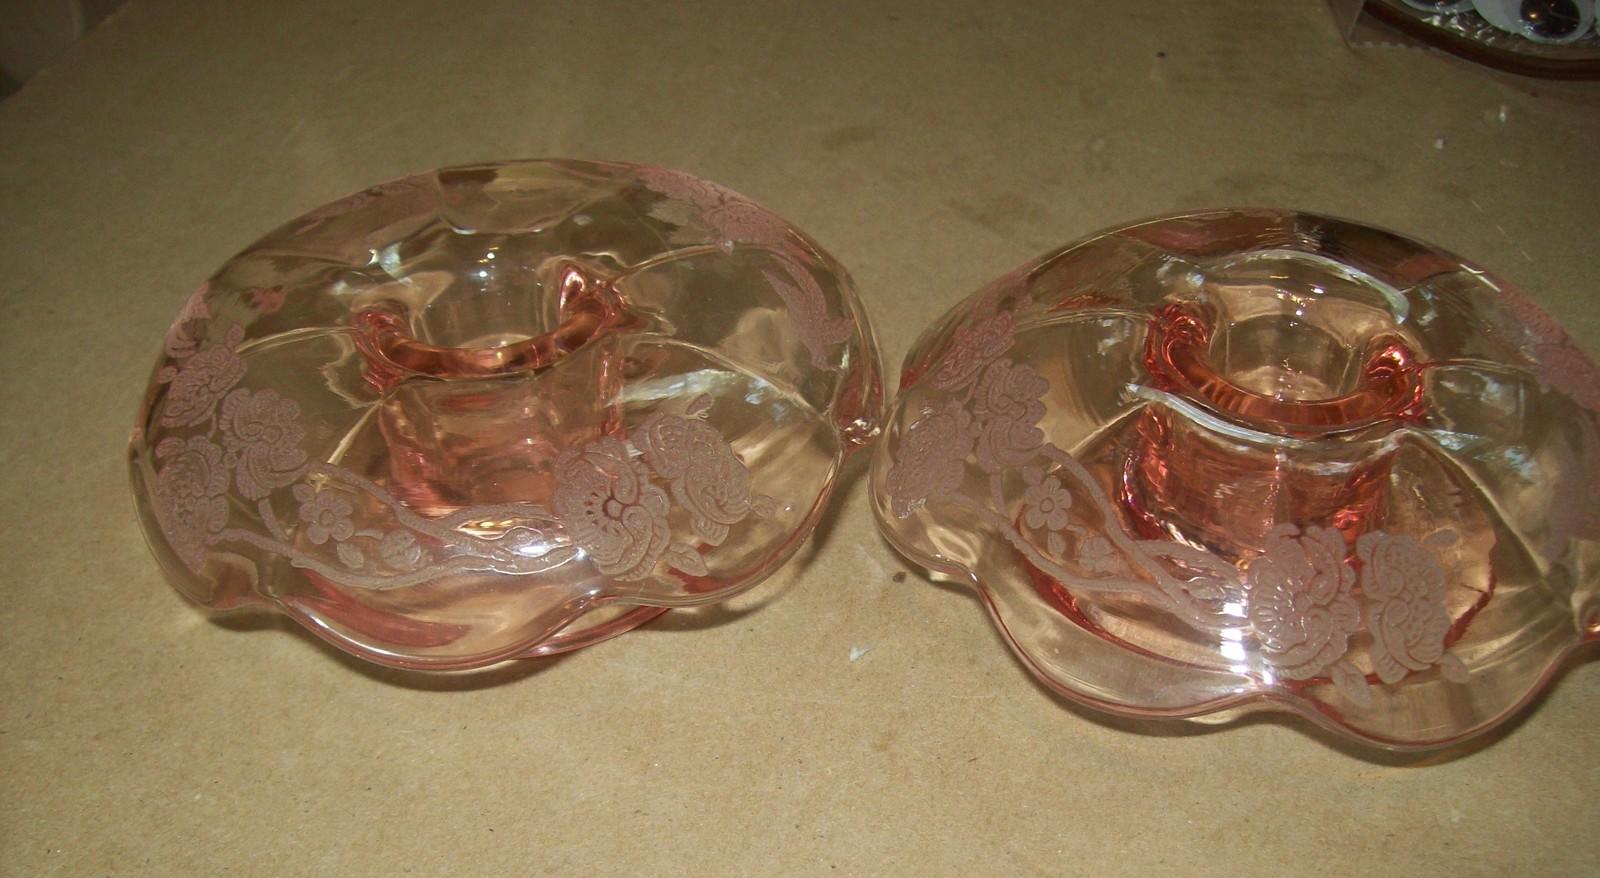 Pink Depression Paden City glass co, Nora Bird  Candlestick Holders Vintage image 3